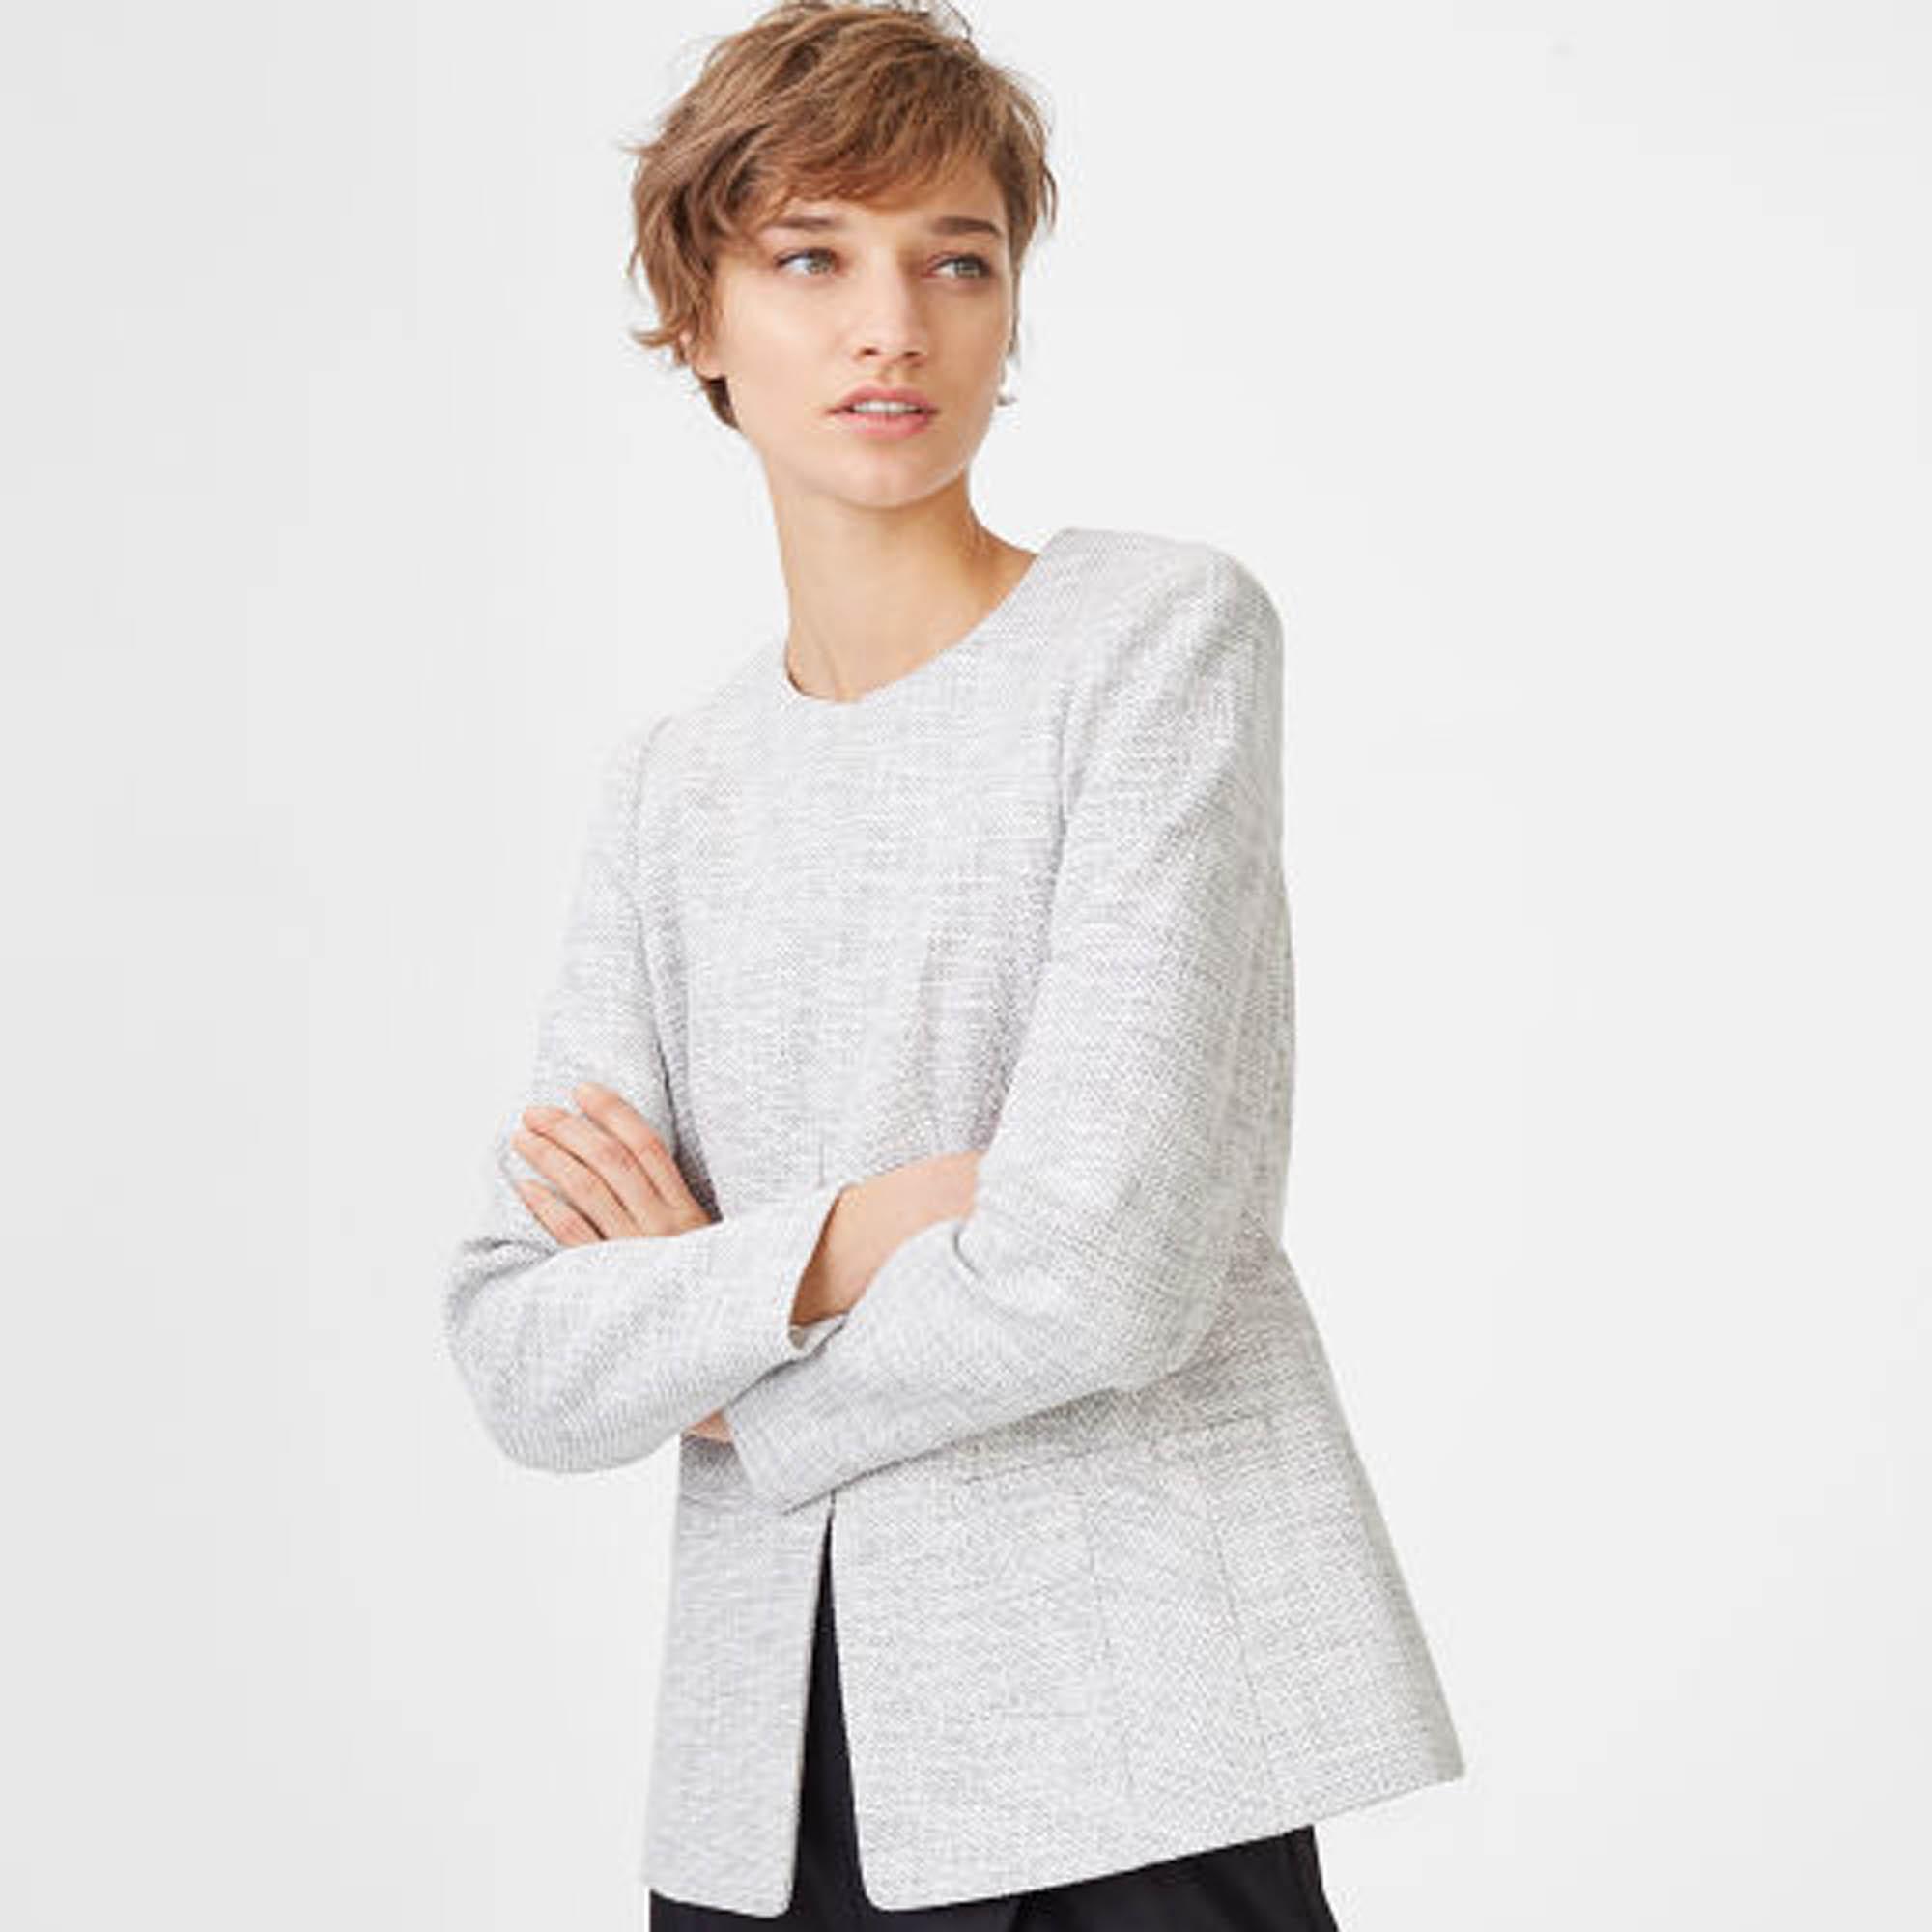 Fadora Jacket   HK$3,290